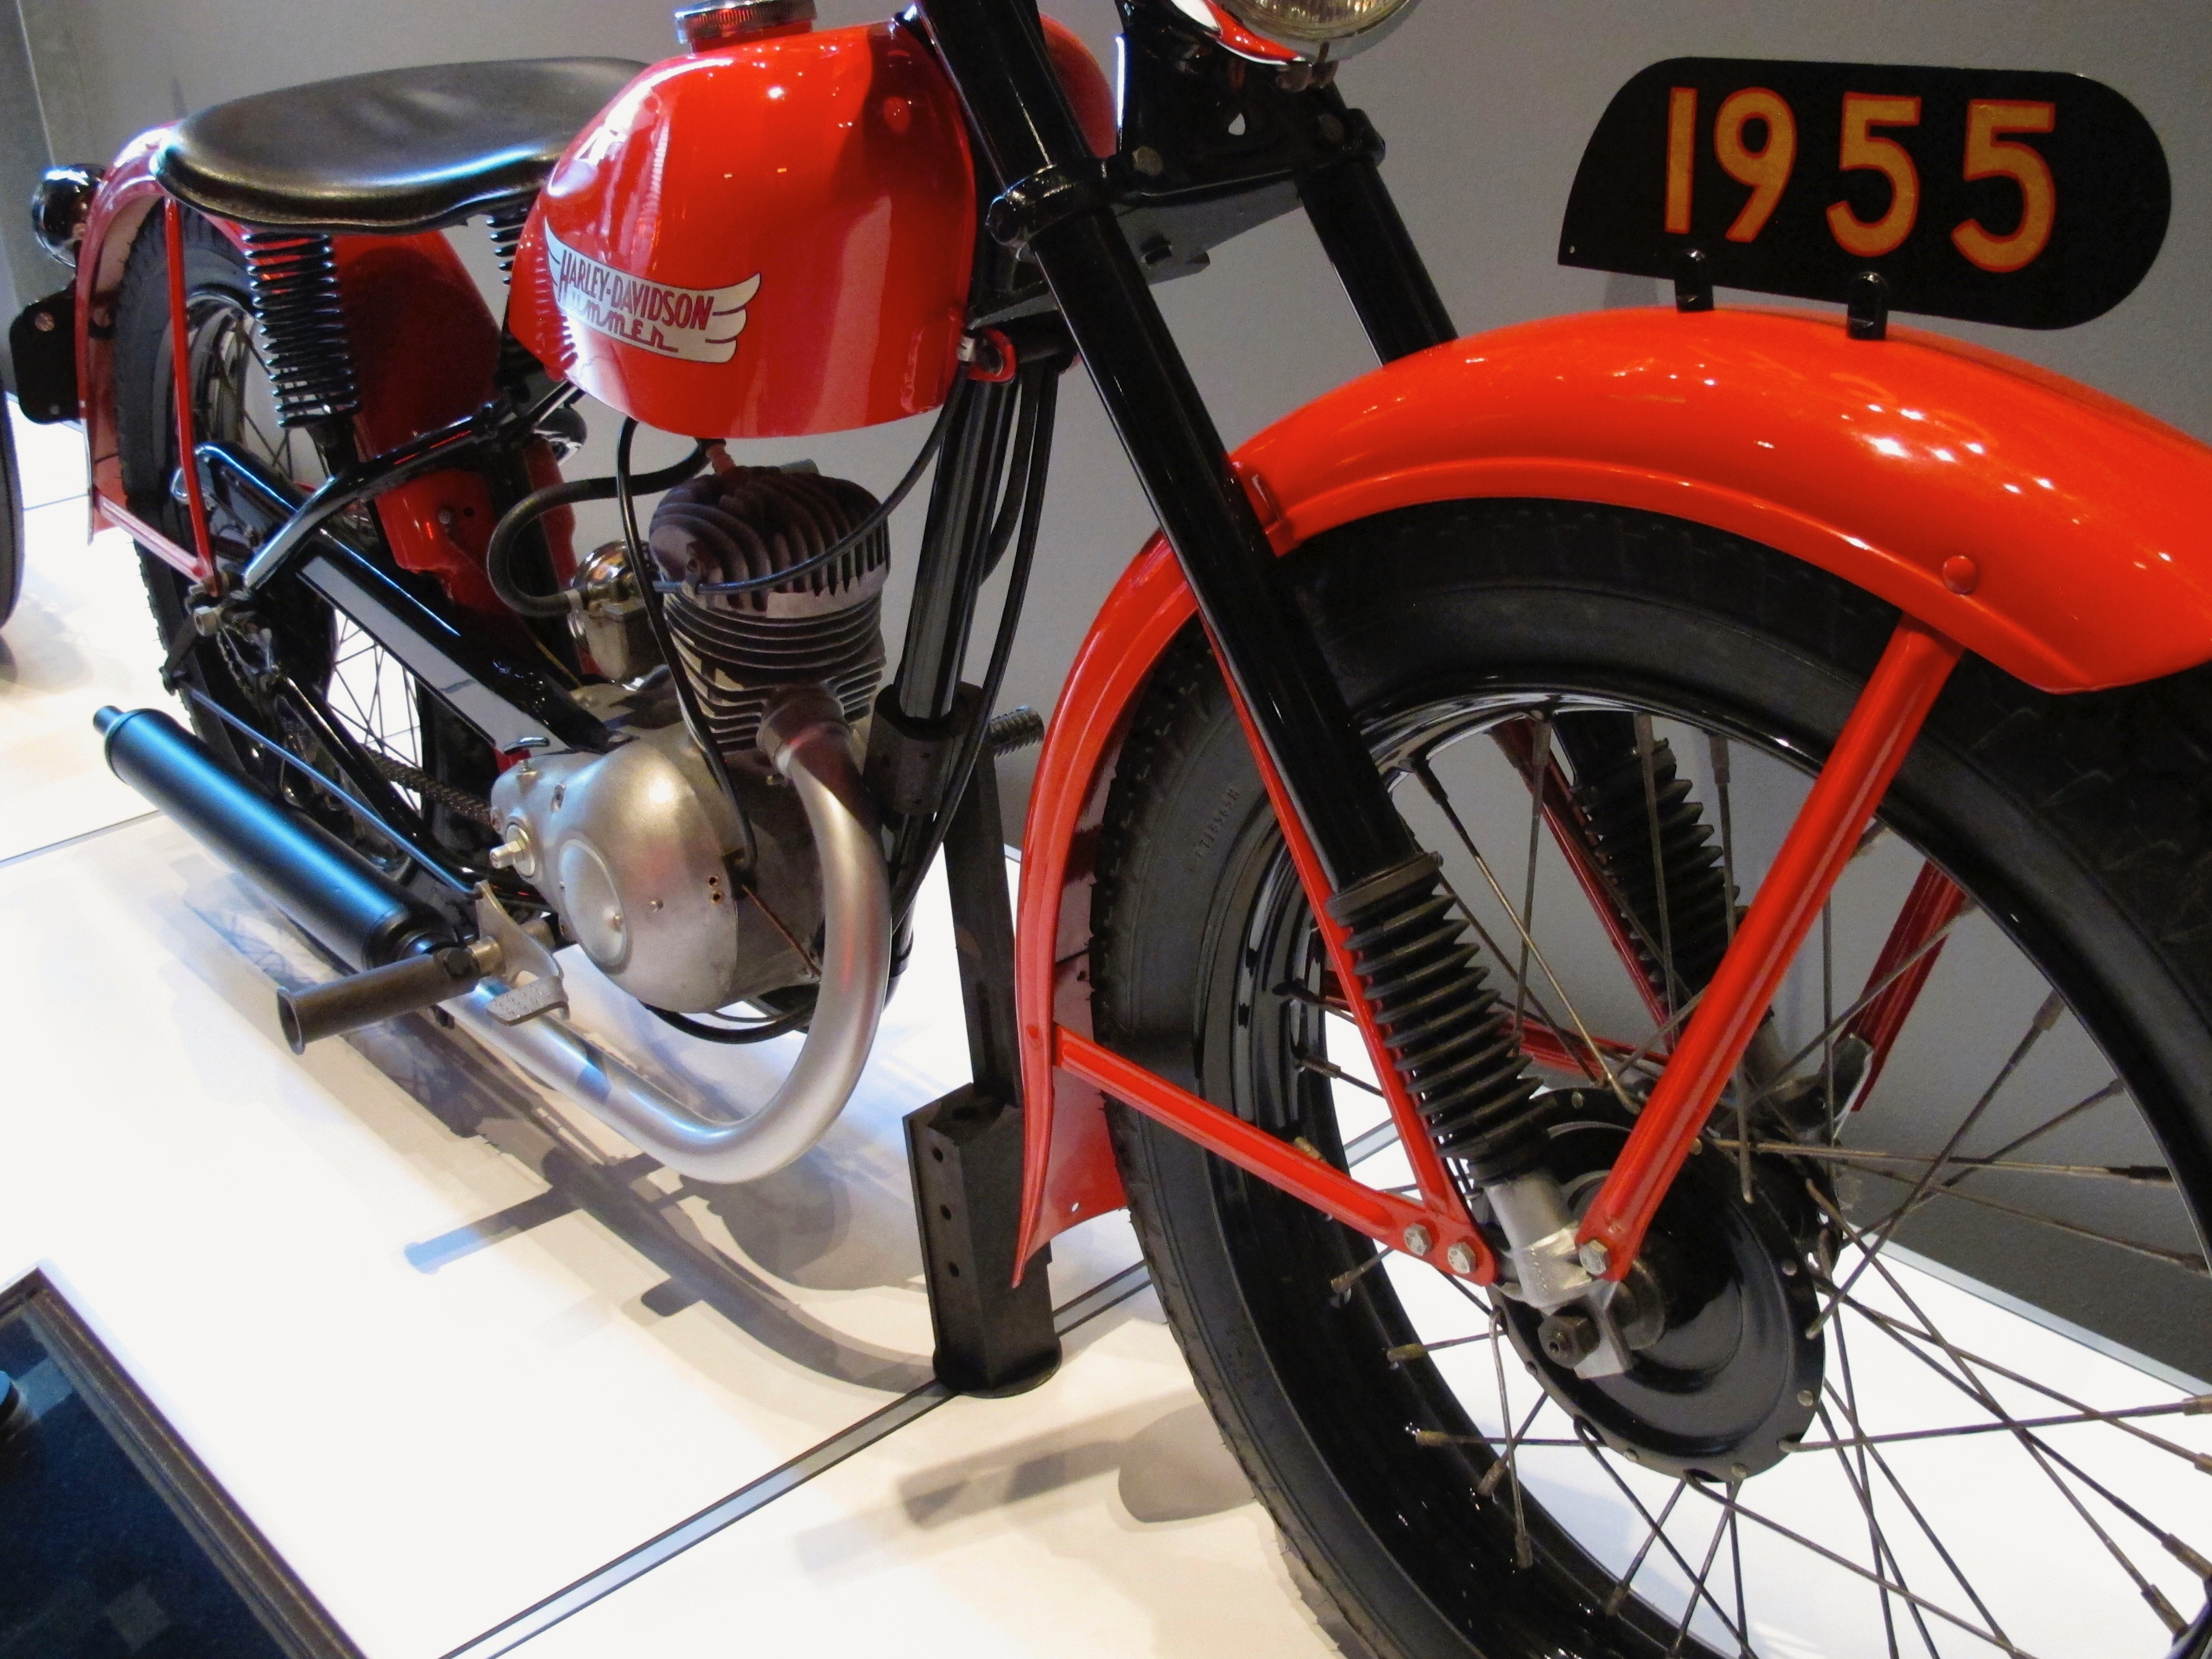 Harley Davidson Two Stroke Engine History